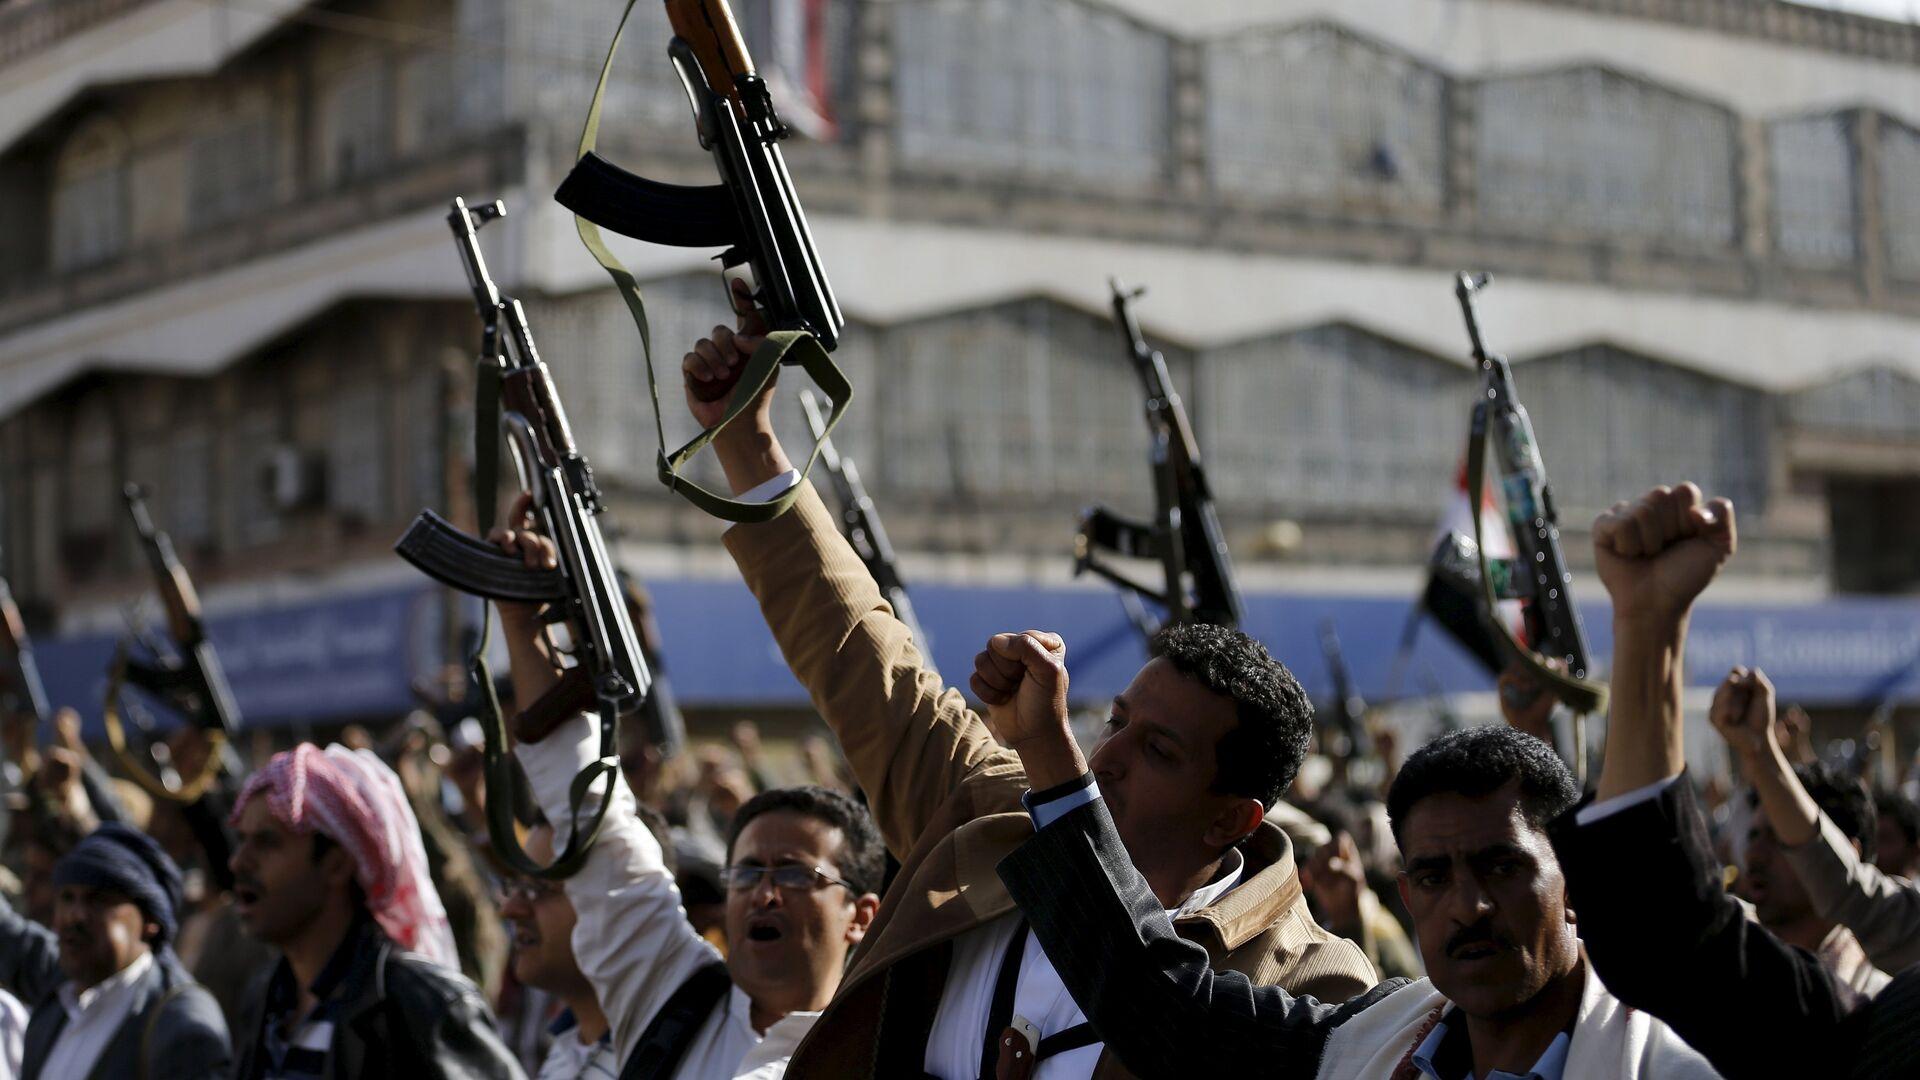 Followers of the Houthi demonstrate against the Saudi-led air strikes on Yemen, in Sanaa April 1, 2015. - Sputnik Mundo, 1920, 05.06.2021